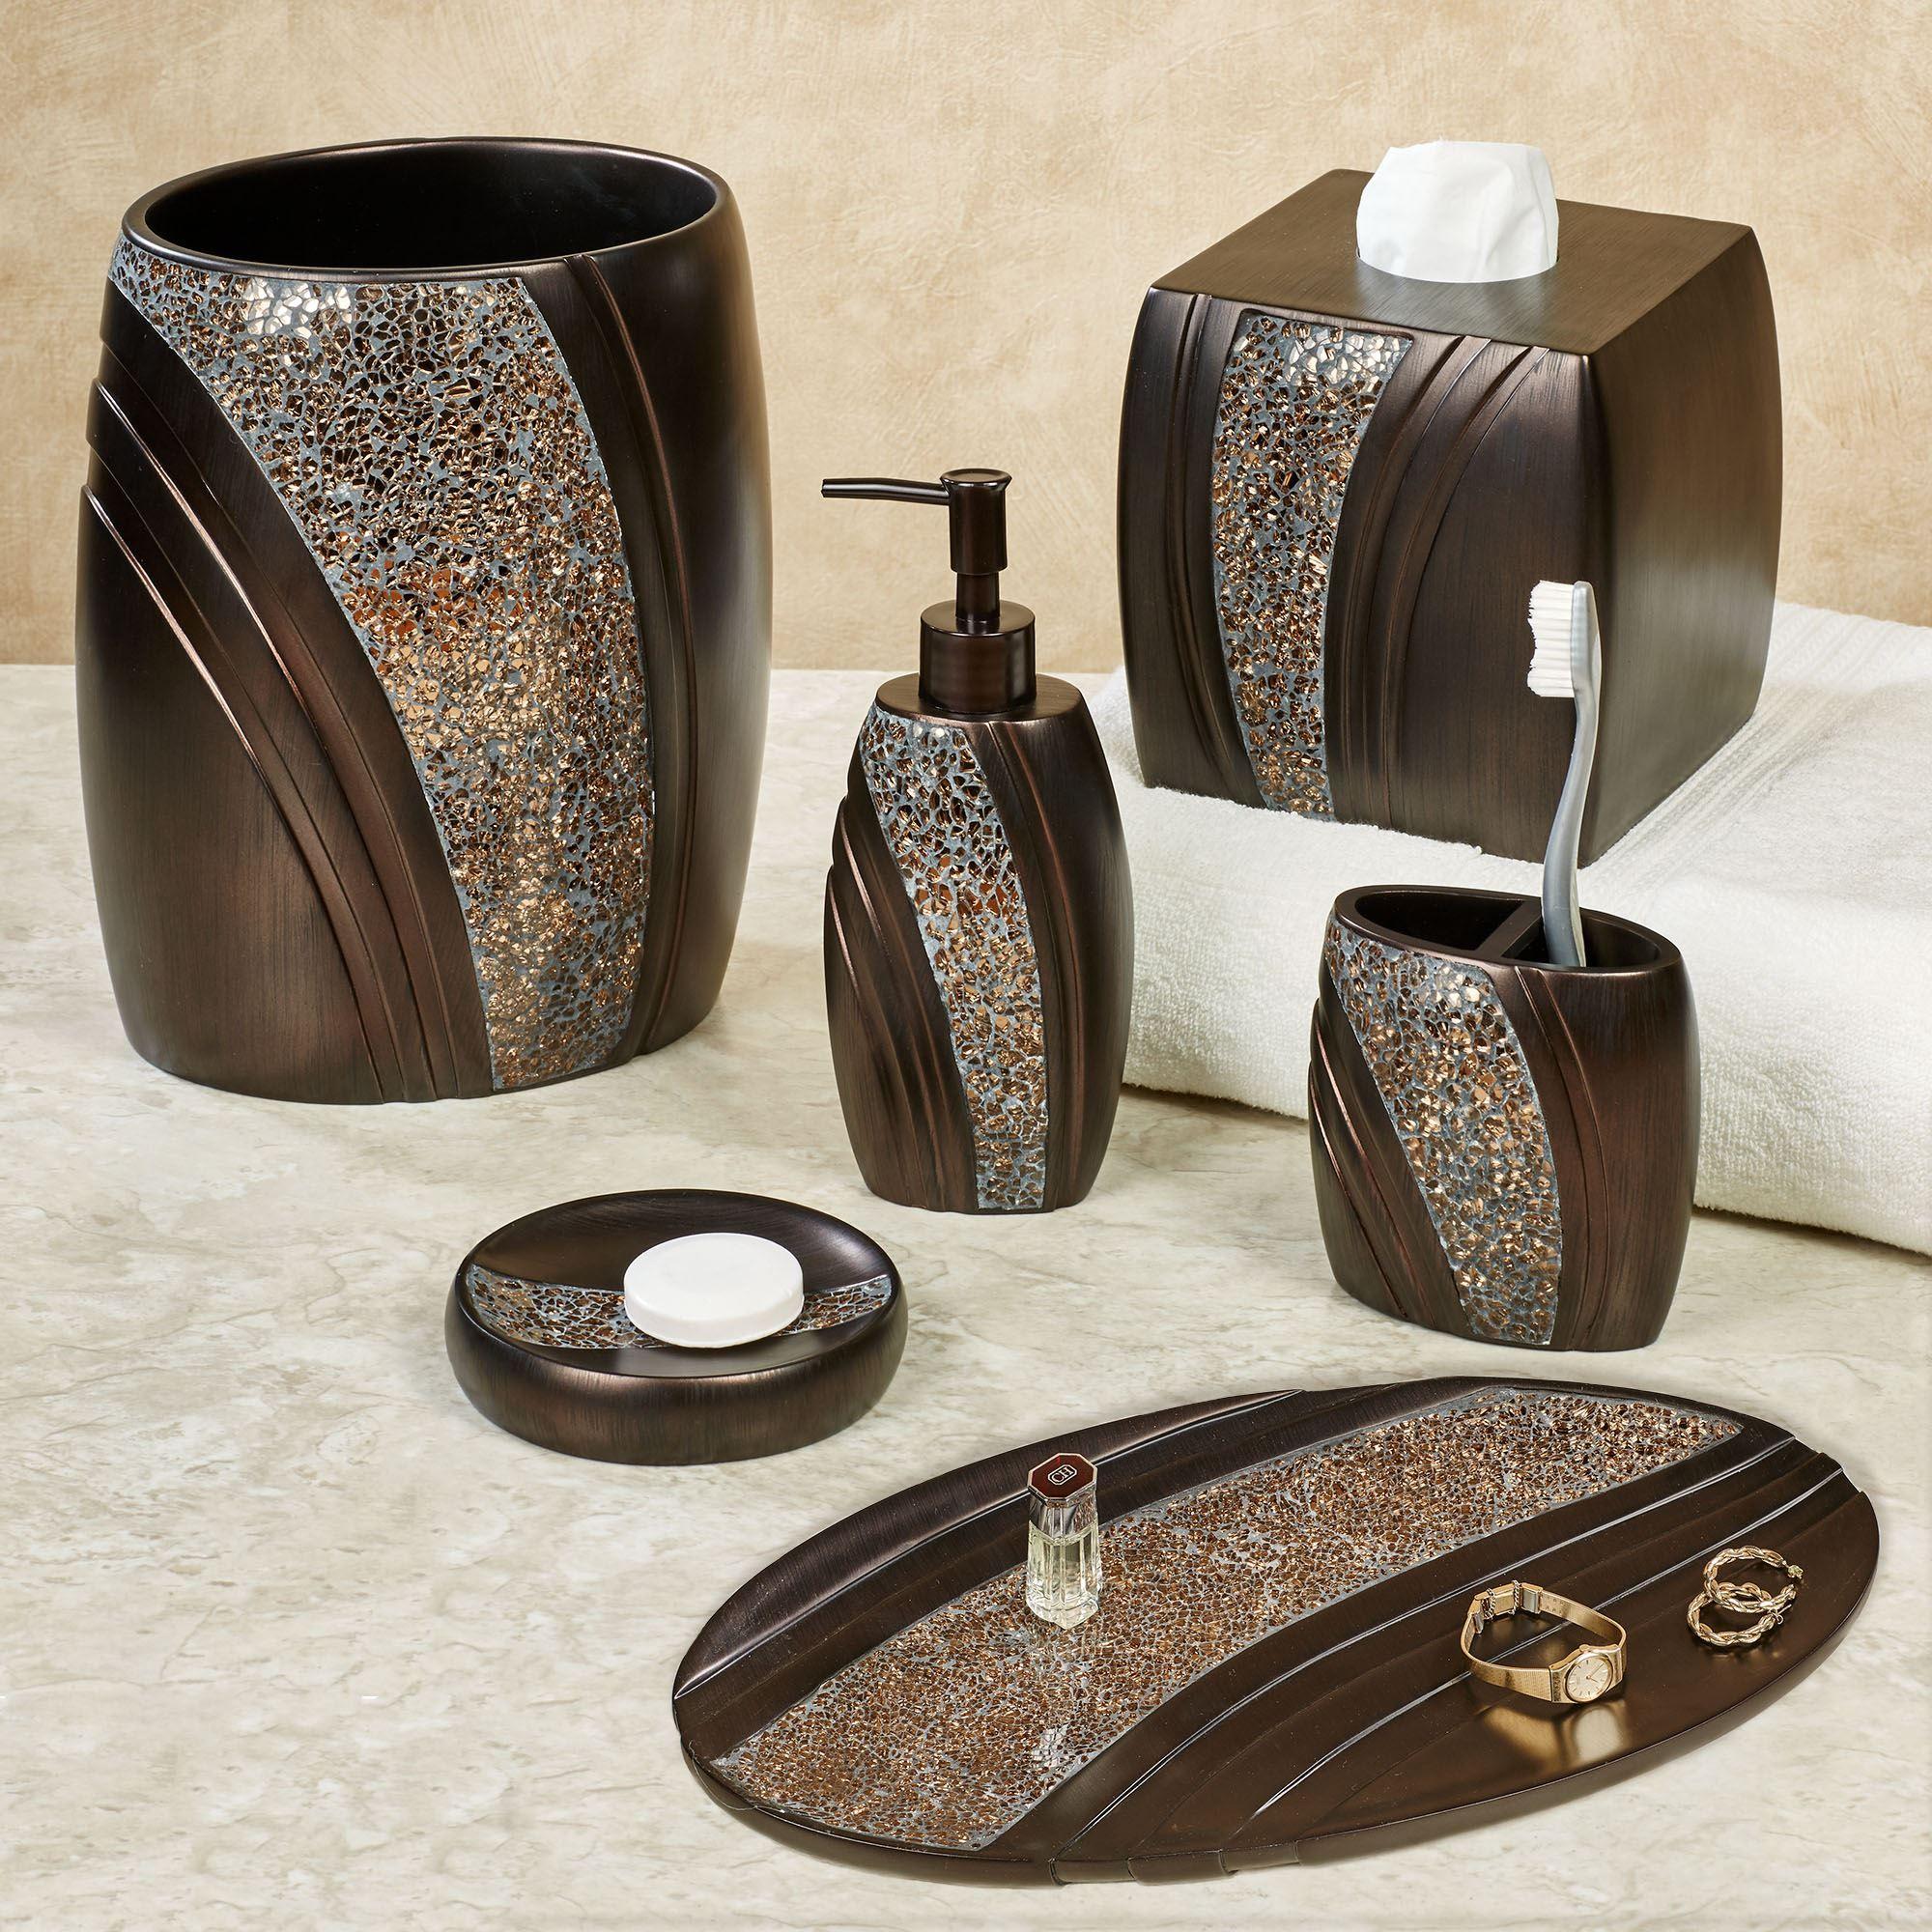 Grandeur Mosaic Bronze Bath Accessories, Bathroom Accessories Bronze